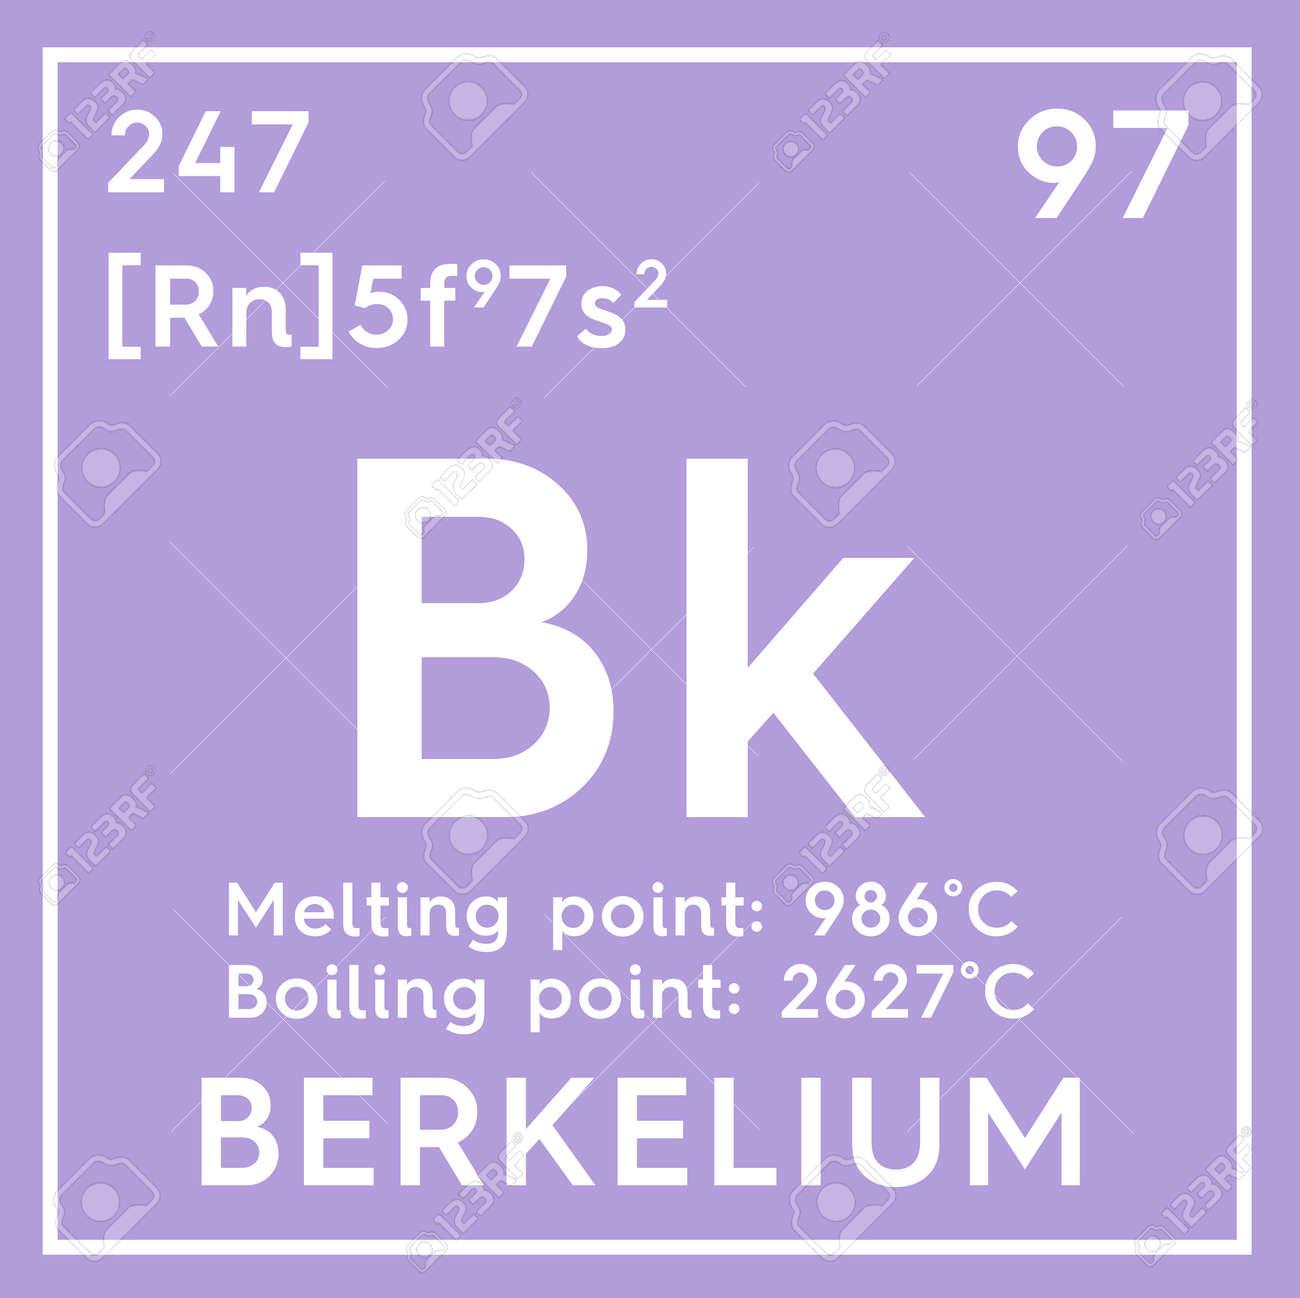 Berkelio actinoides elemento qumico de la tabla peridica de elemento qumico de la tabla peridica de mendeleev berkelium en concepto urtaz Choice Image